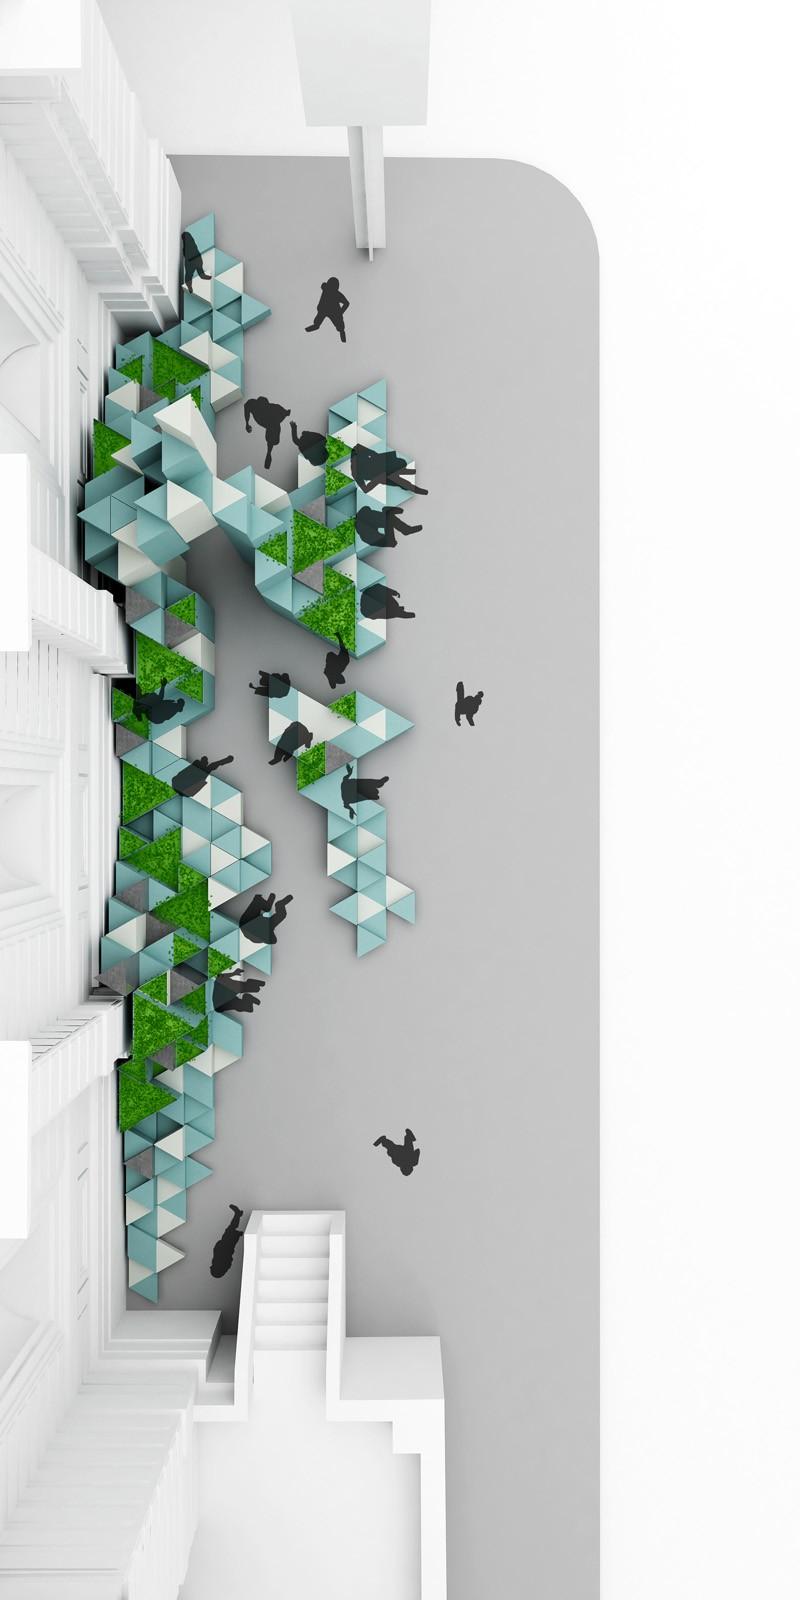 contemporary-installation_030715_08-800x1600